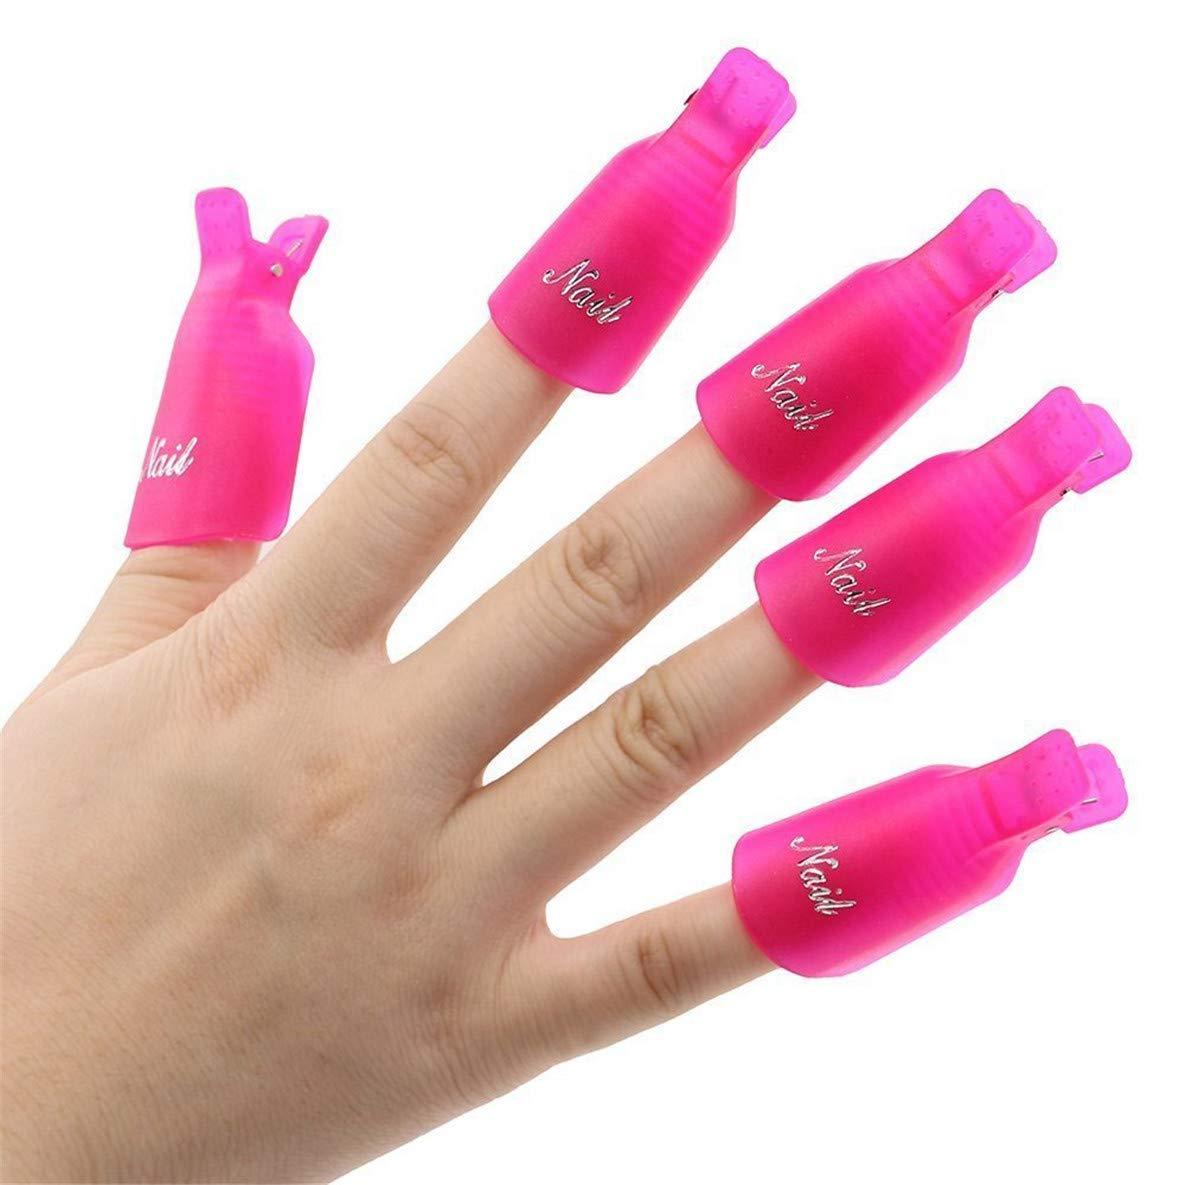 IME Nail Polish Remover Clips Set, Nails Art Gel Cap Soak Off Clip UV Manicure Acrylic Nails Wrap Tool Rose Red Colour10pcs